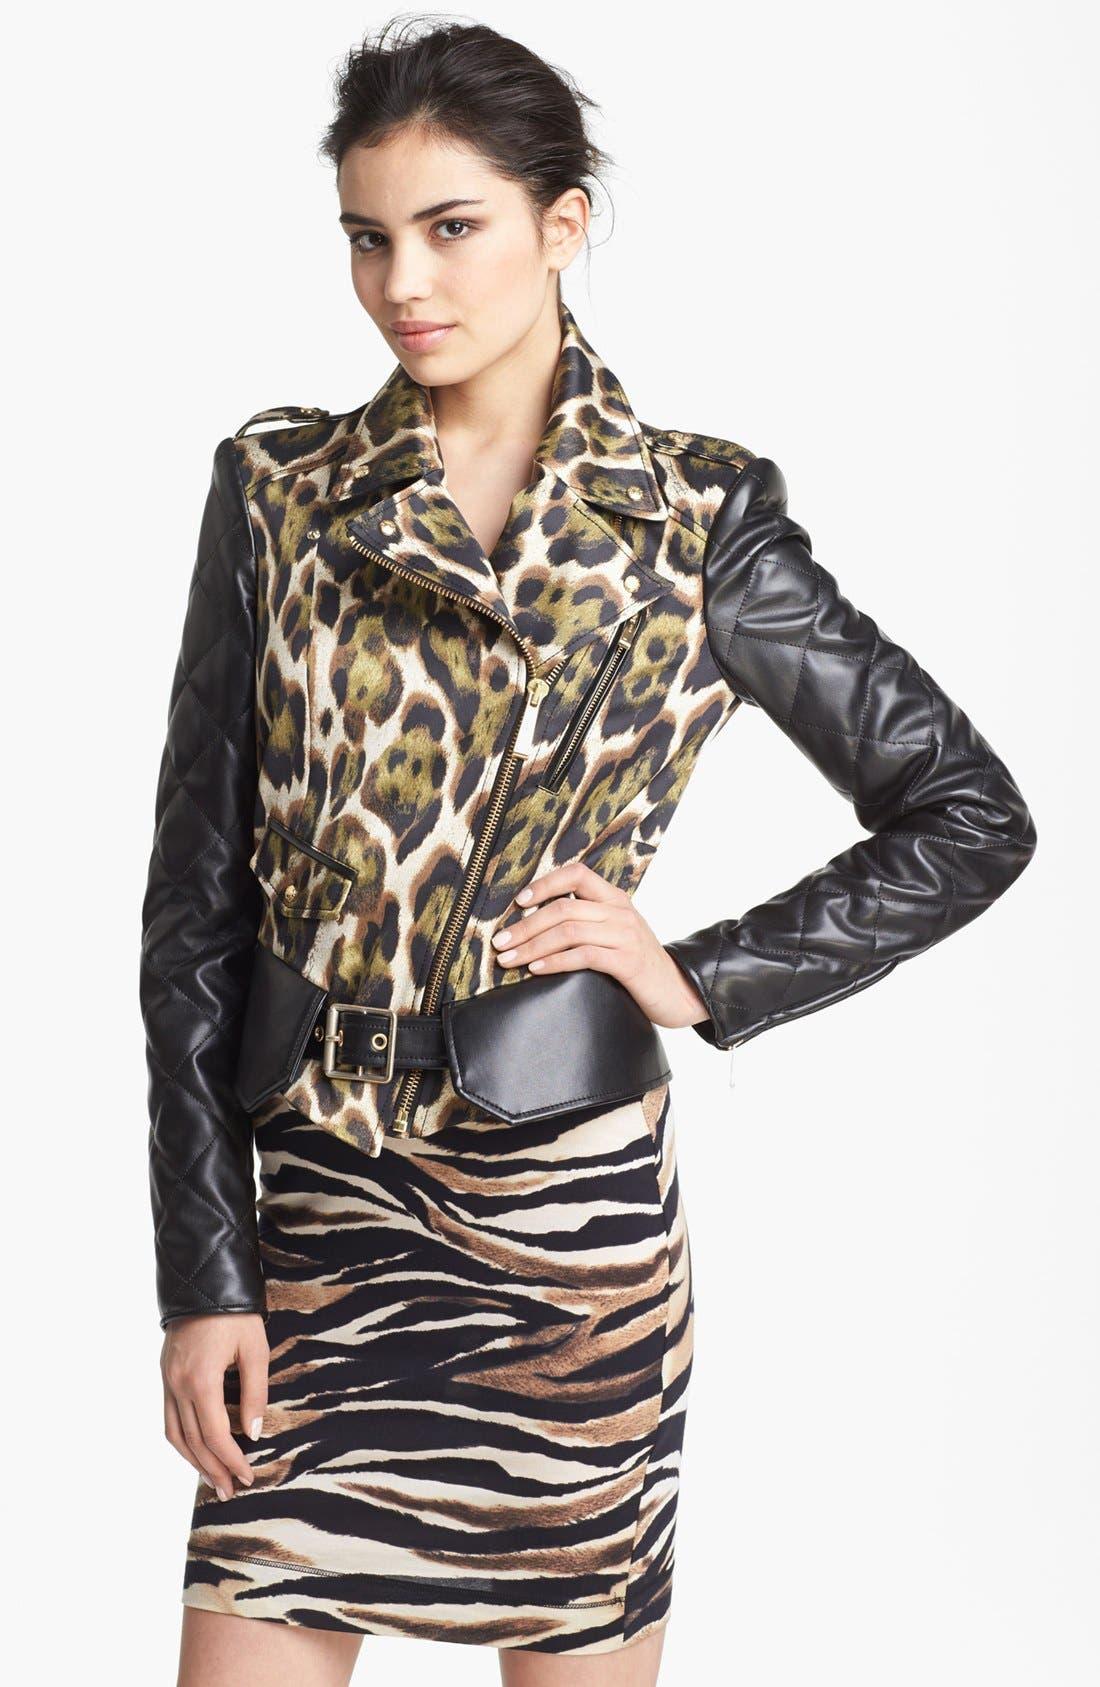 Alternate Image 1 Selected - Just Cavalli Canvas & Leather Moto Jacket